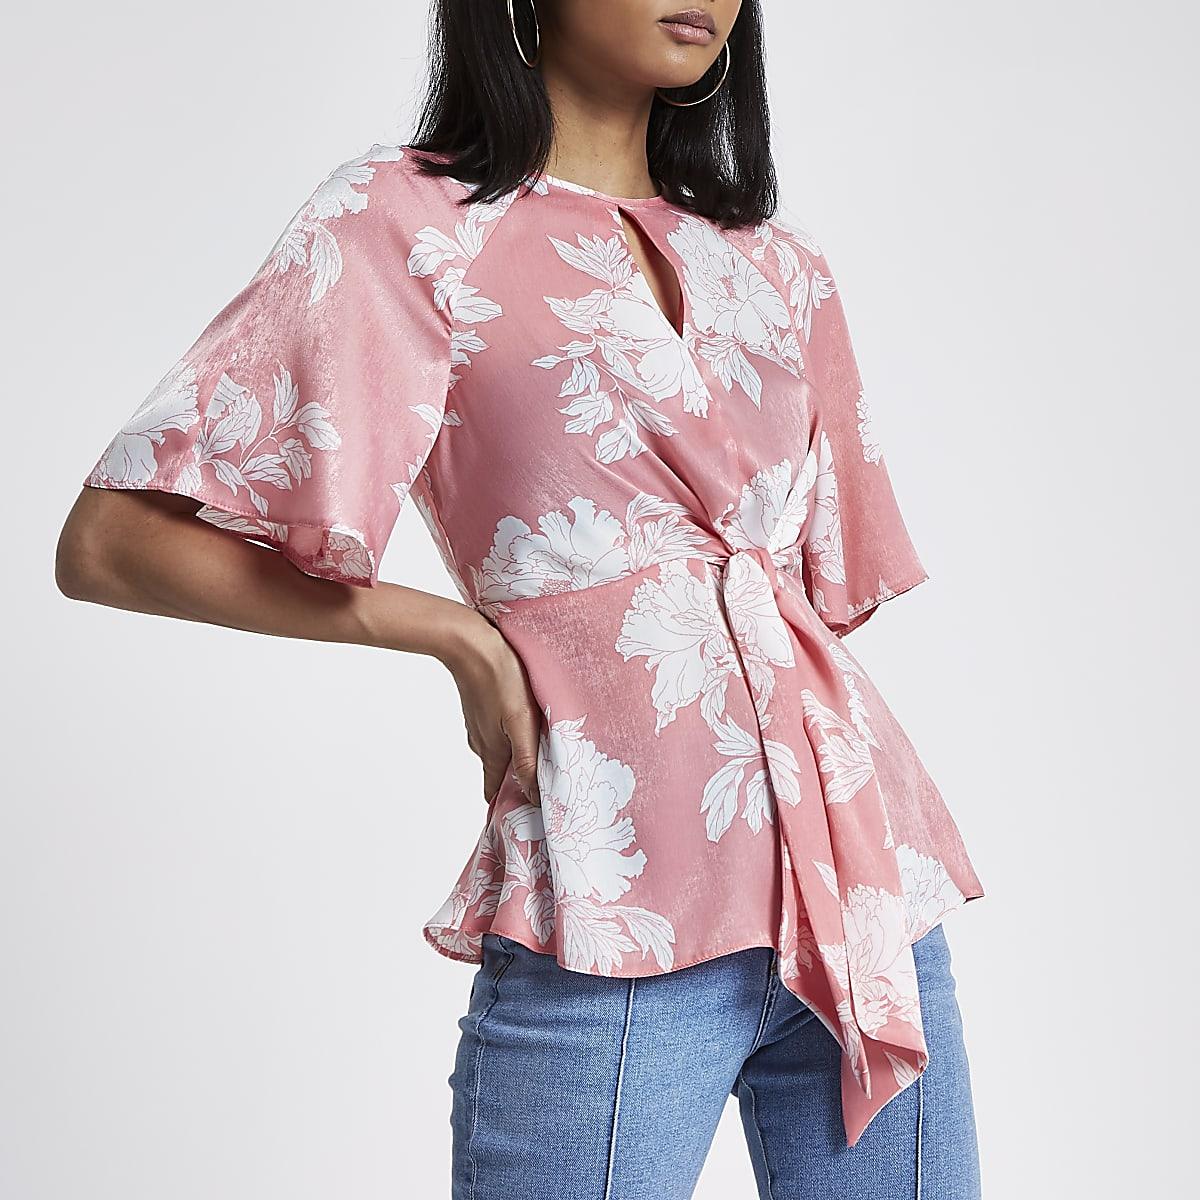 fd7938409f038c Pink floral print tie front frill hem blouse - Blouses - Tops - women